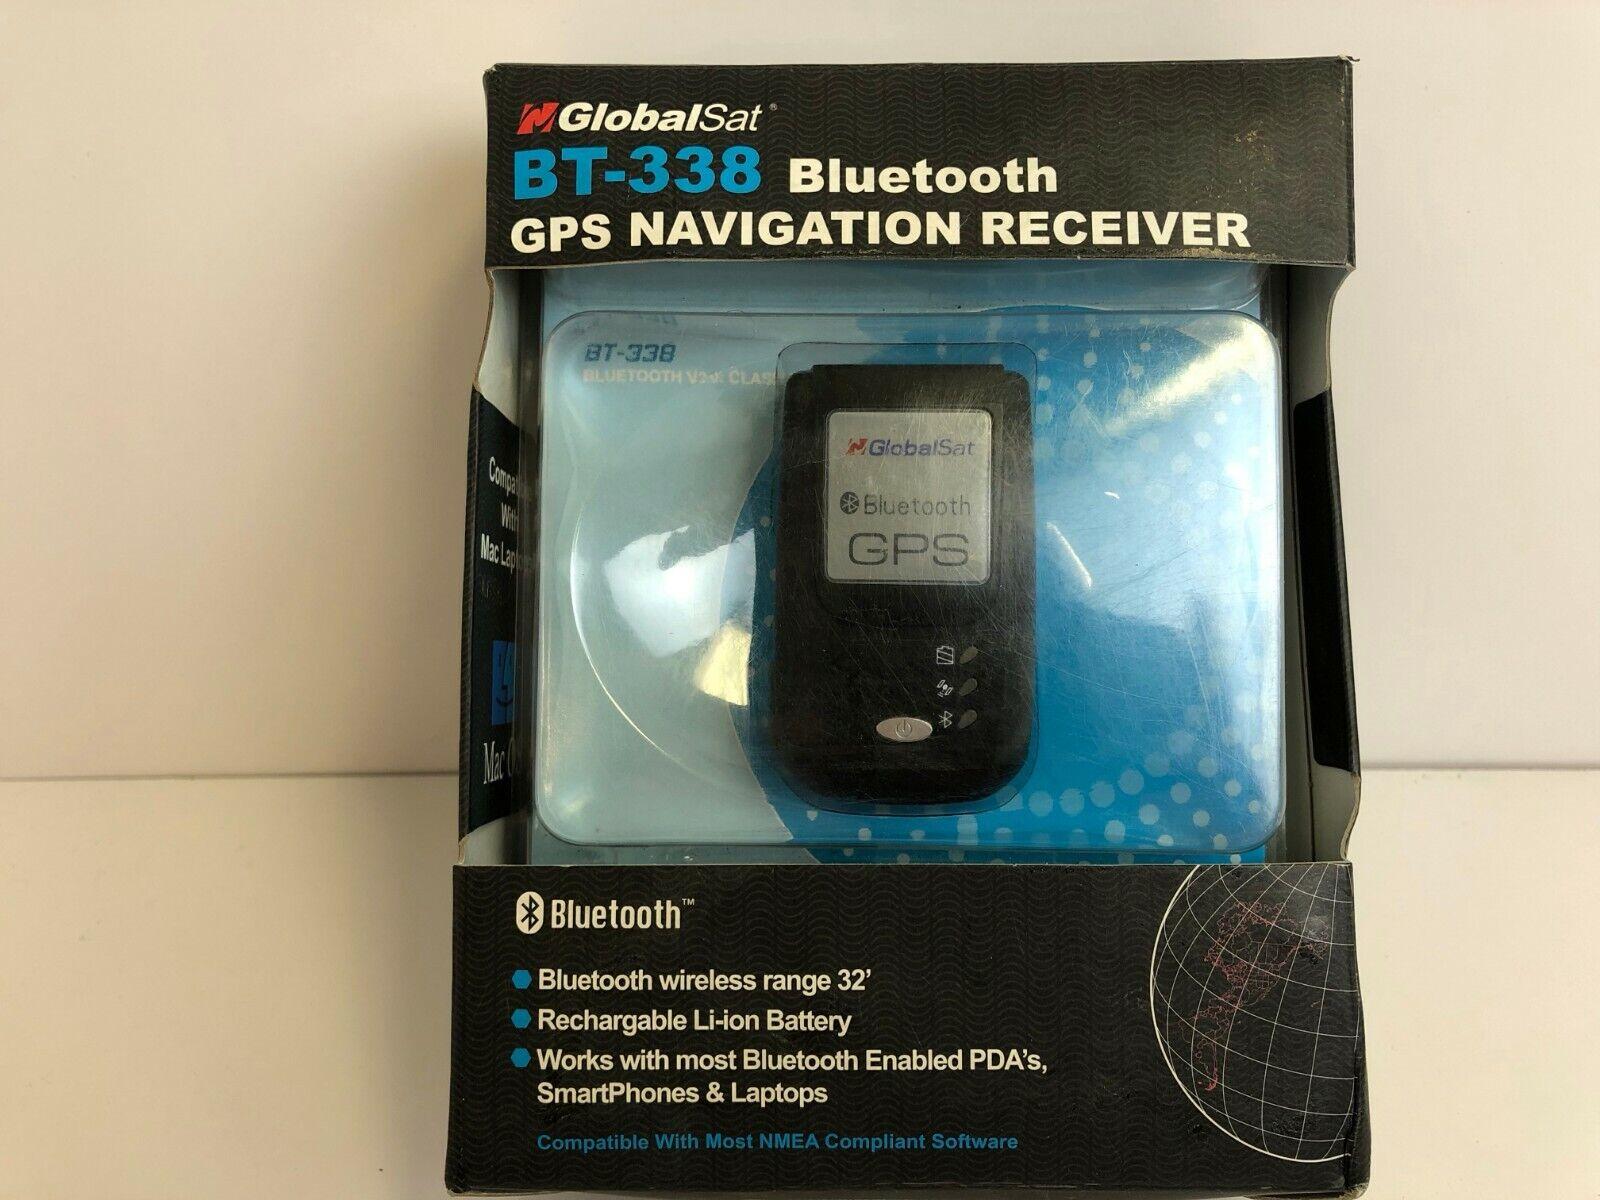 GlobalSat BT-338 GPS Bluetooth Receiver SiRF